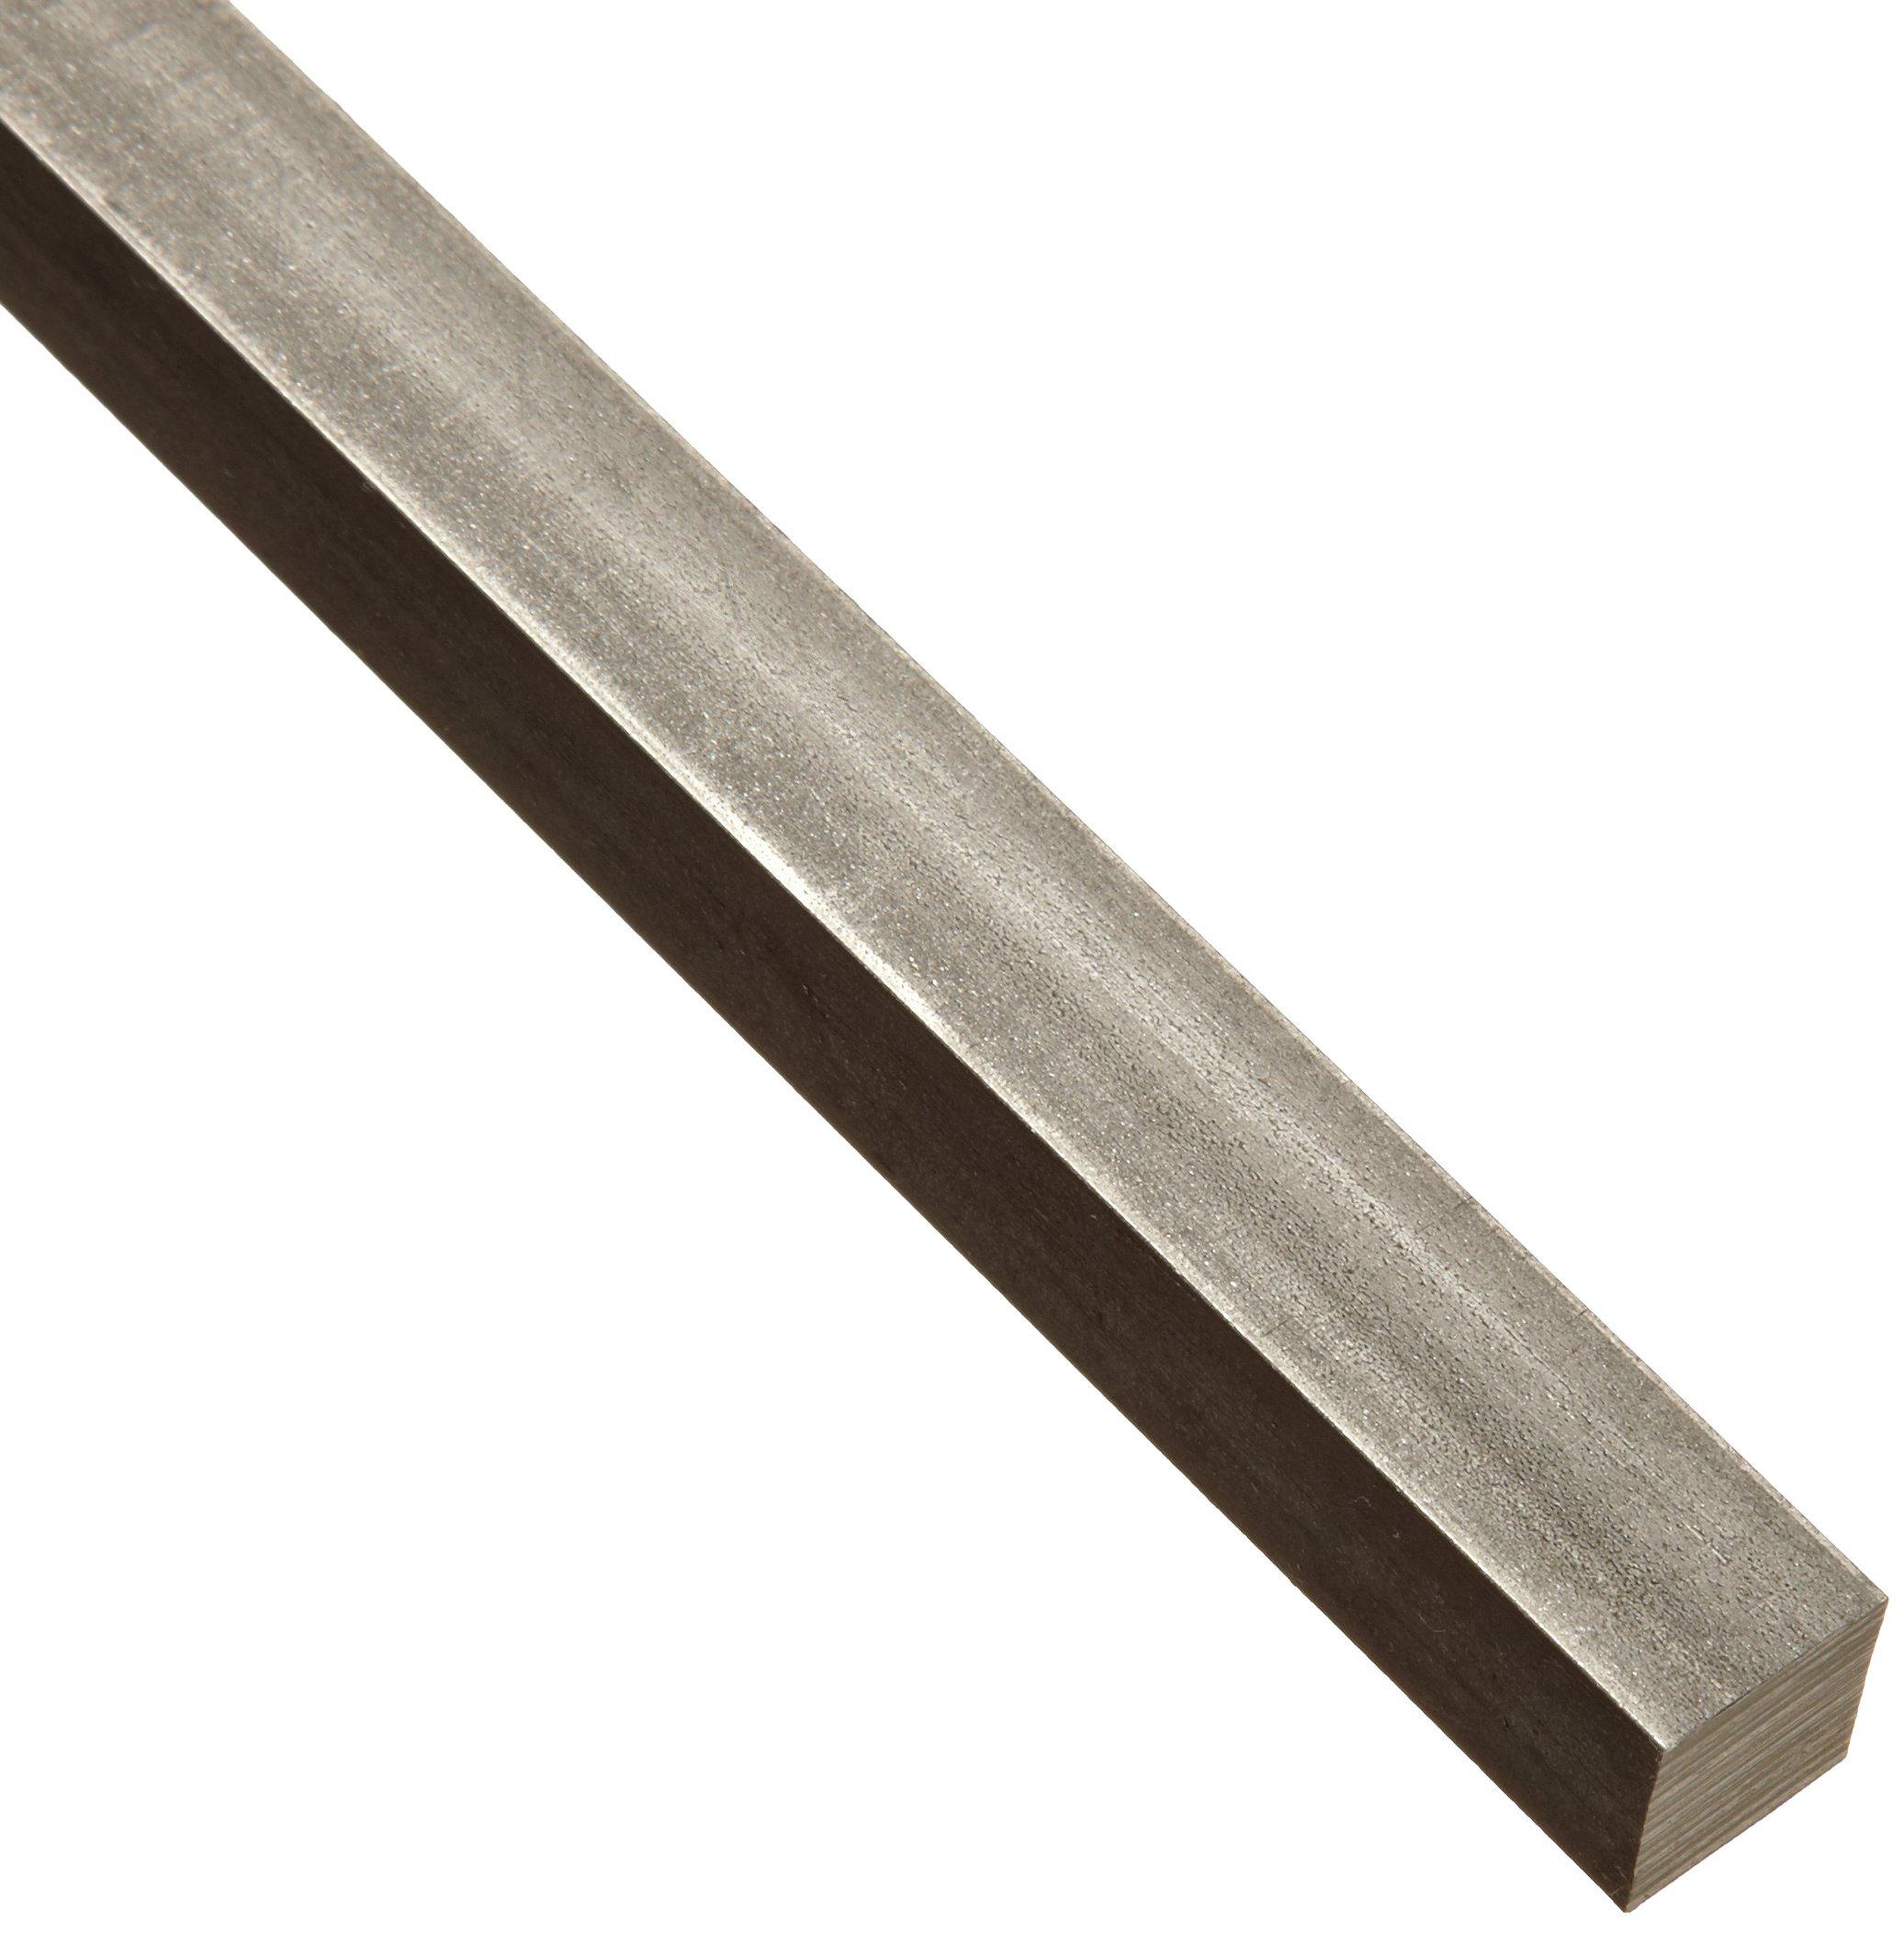 18-8 Stainless Steel Key Stock, Undersized